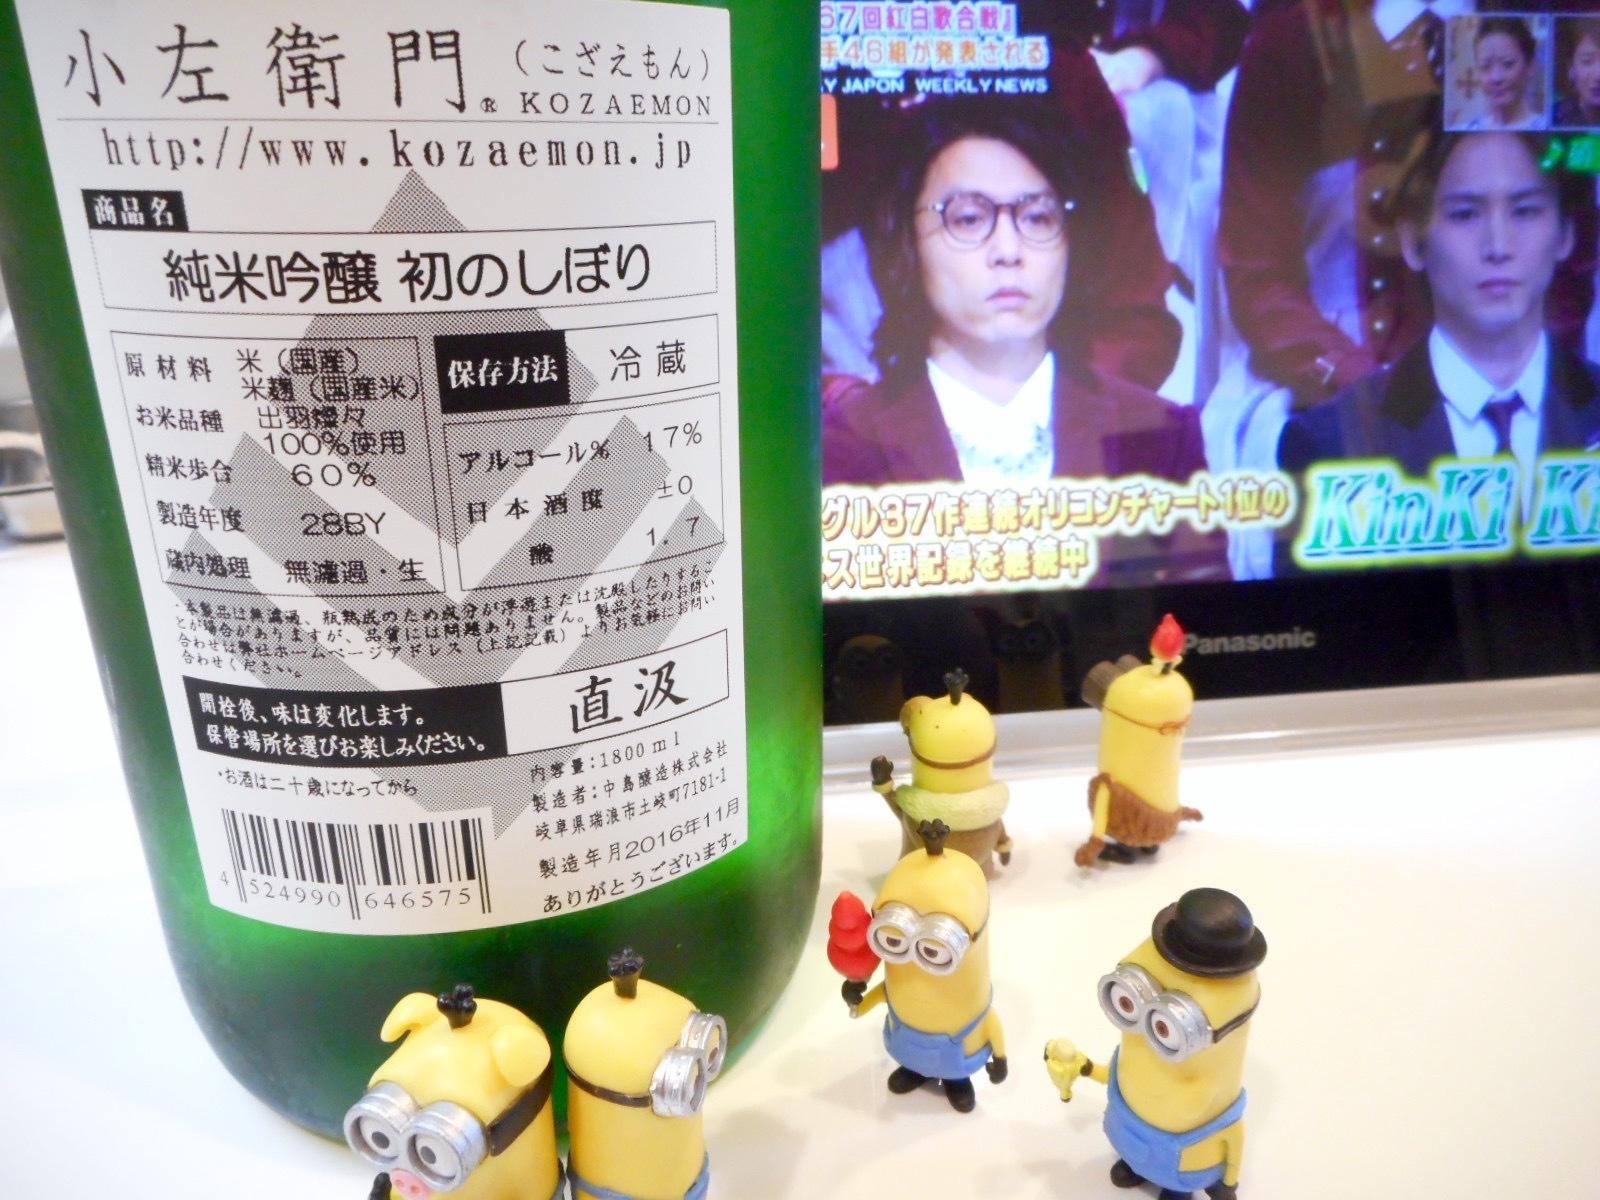 kozaemon_hatsunoshibori_jikagumi28by3.jpg